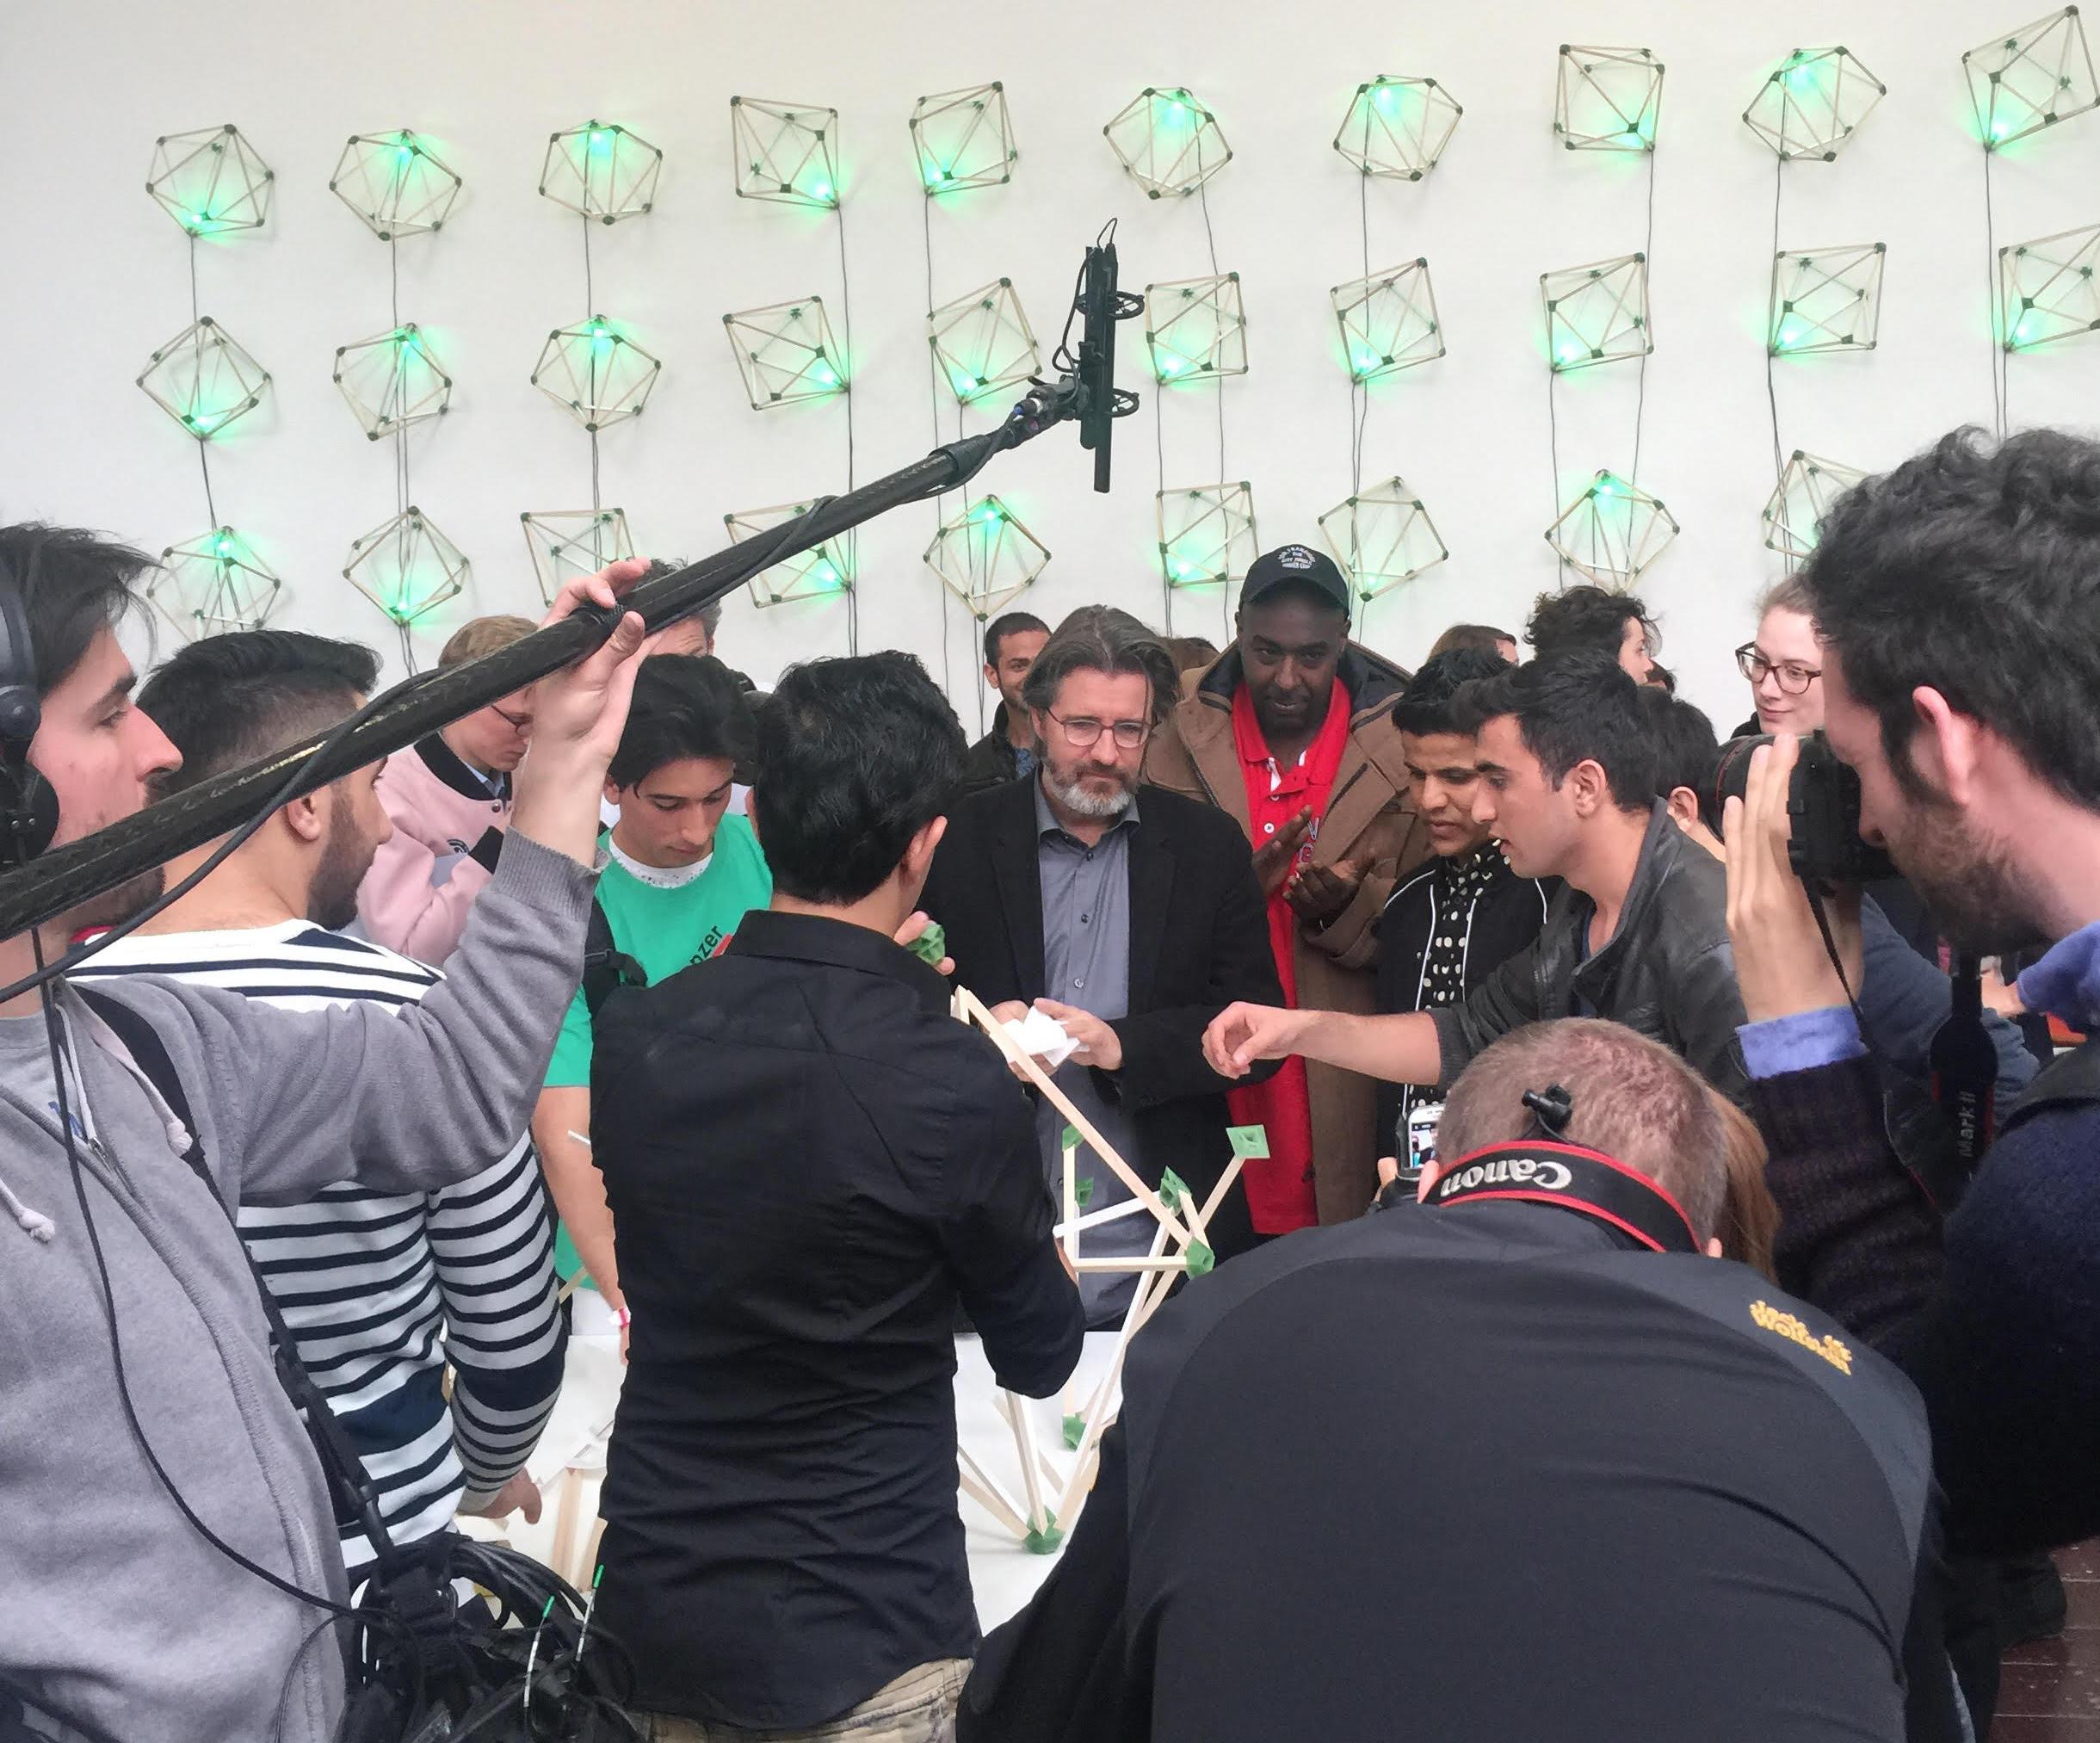 Olafur Eliasson at TBA21 Green Light